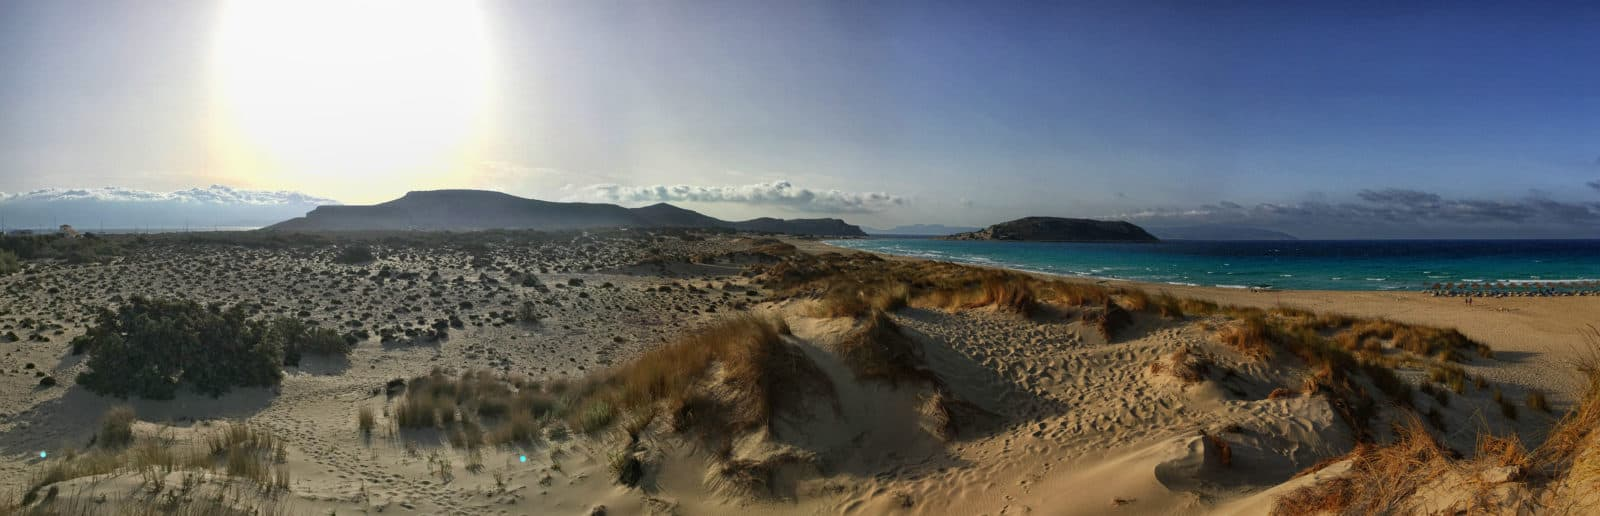 Elafonisos Asami Beach im September